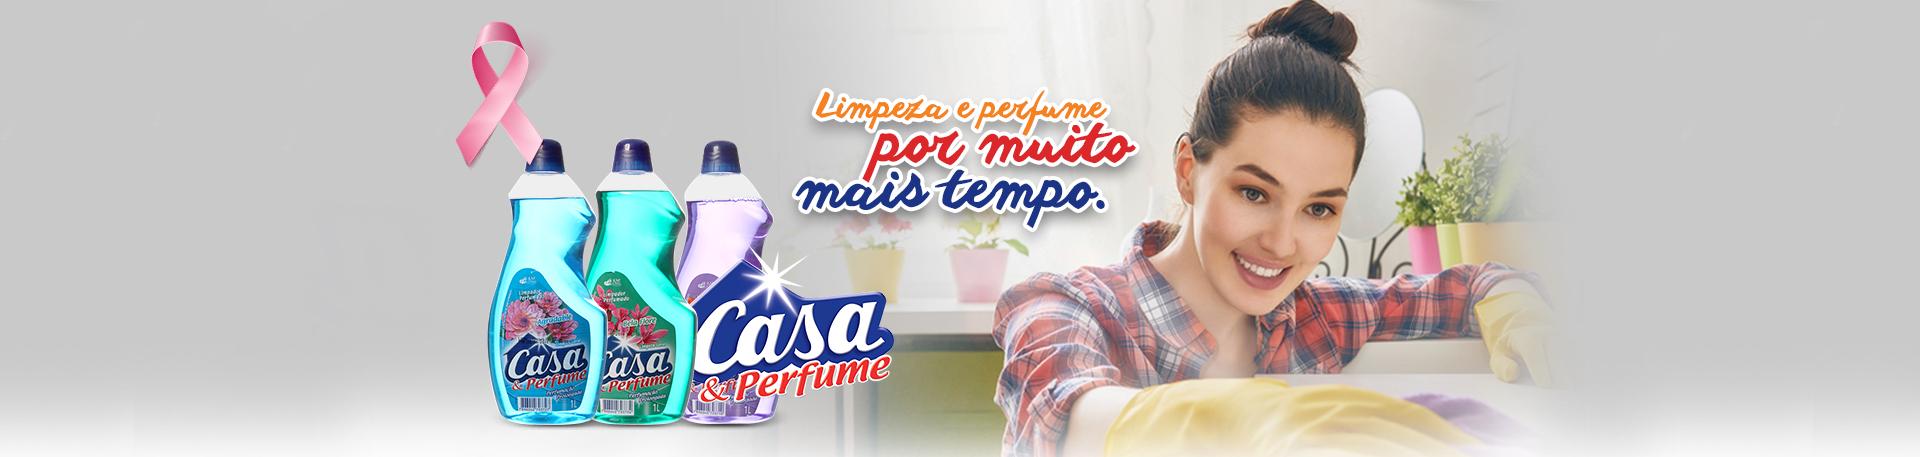 Casa & Perfume